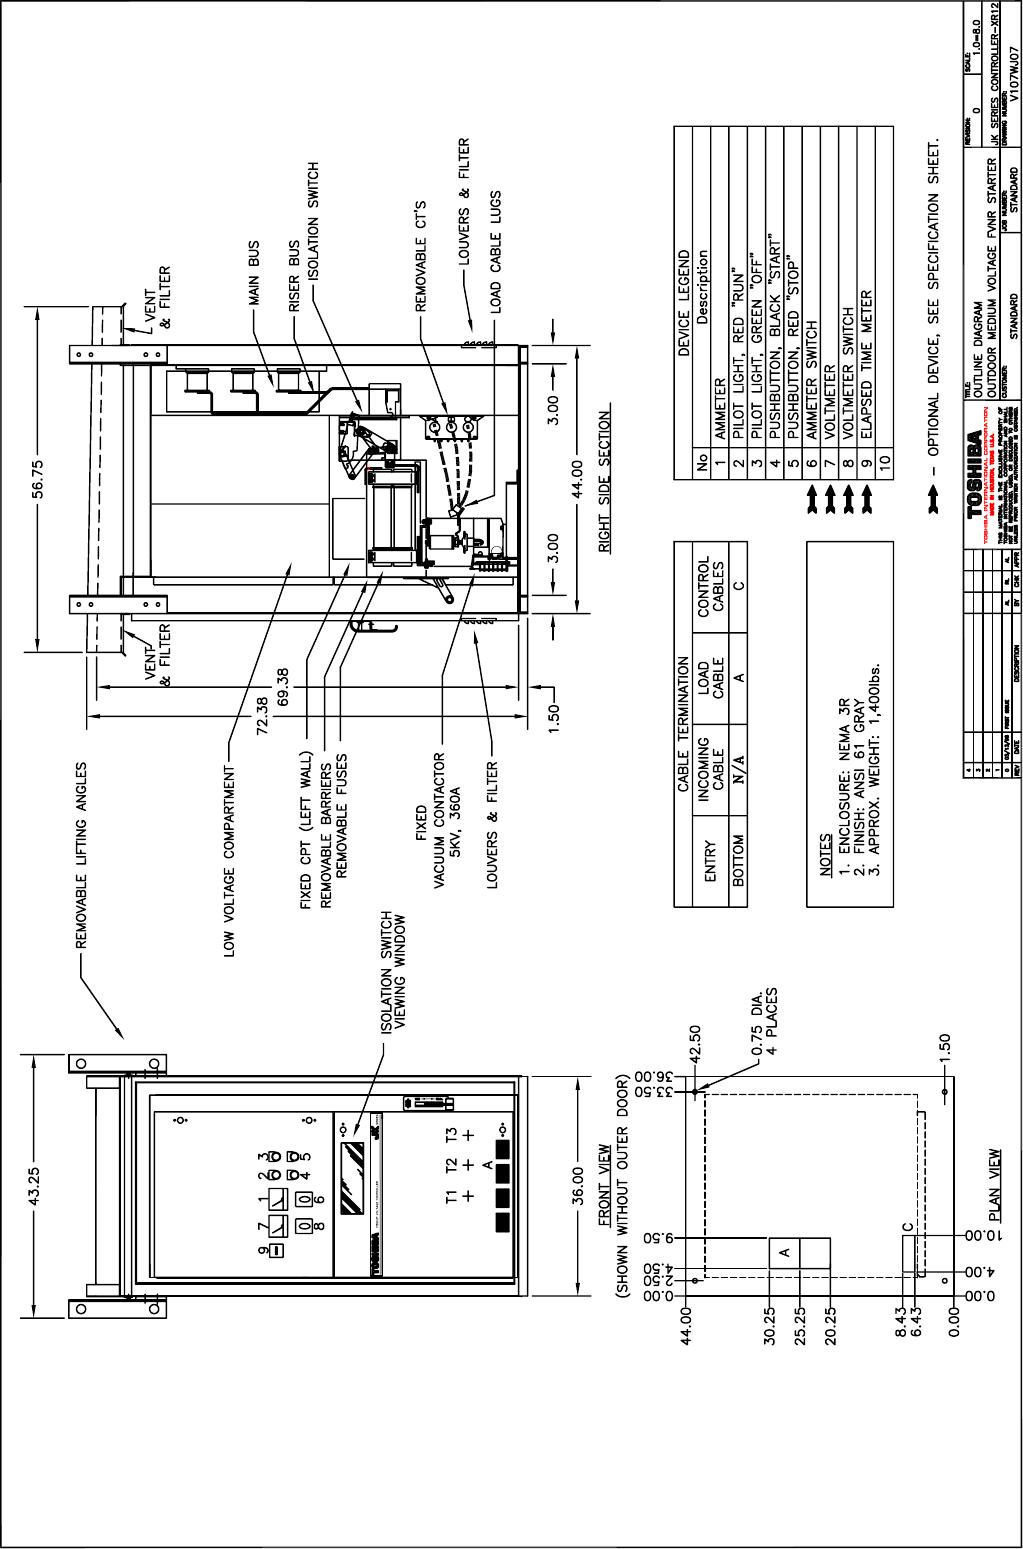 Toshiba Xt Jk Series Brochure Jkfixed400a720a G7 Wiring Diagram Medium Voltage Motor Drive